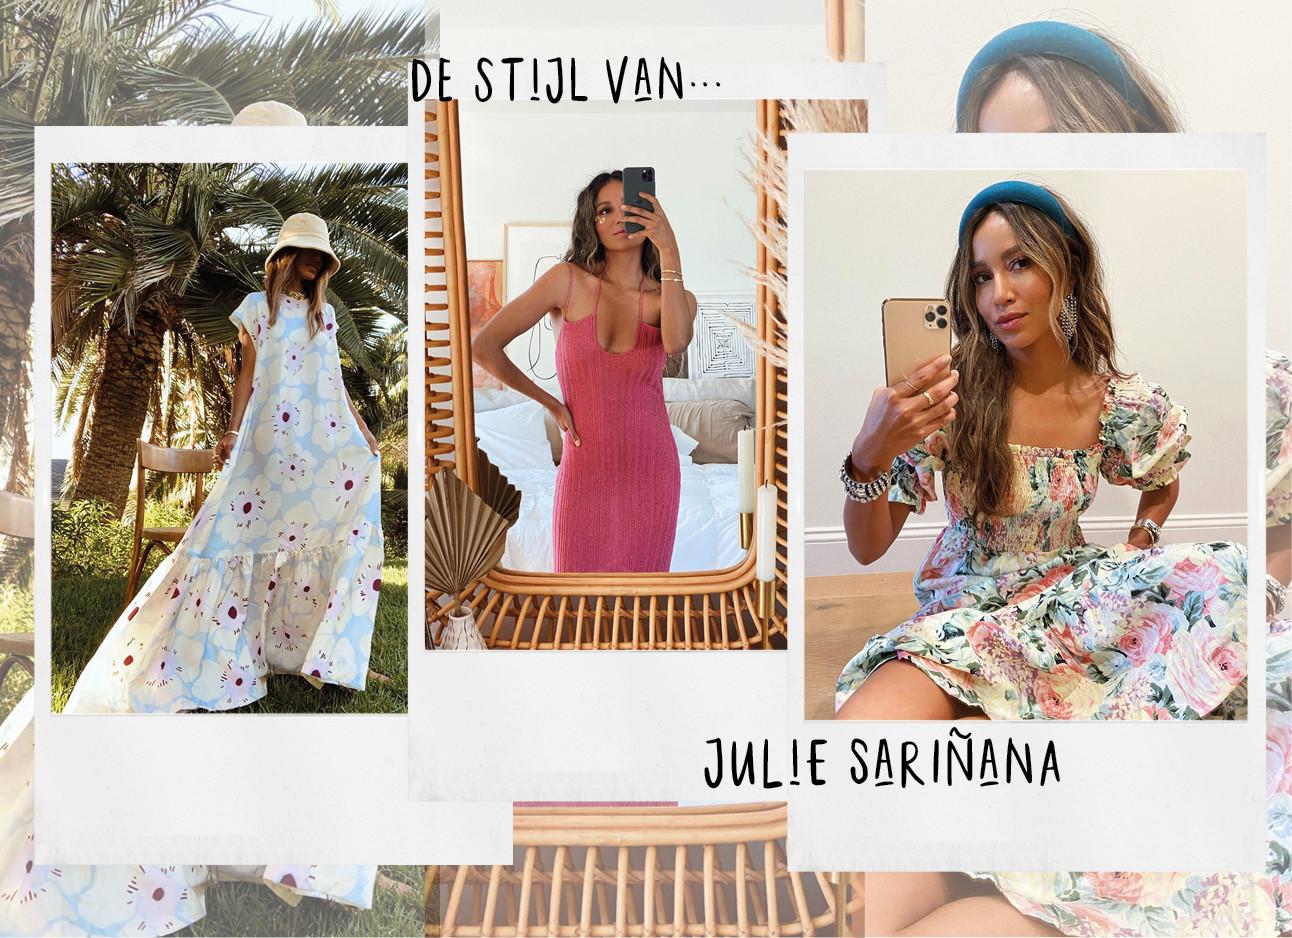 De stijl van Julie Sariñana